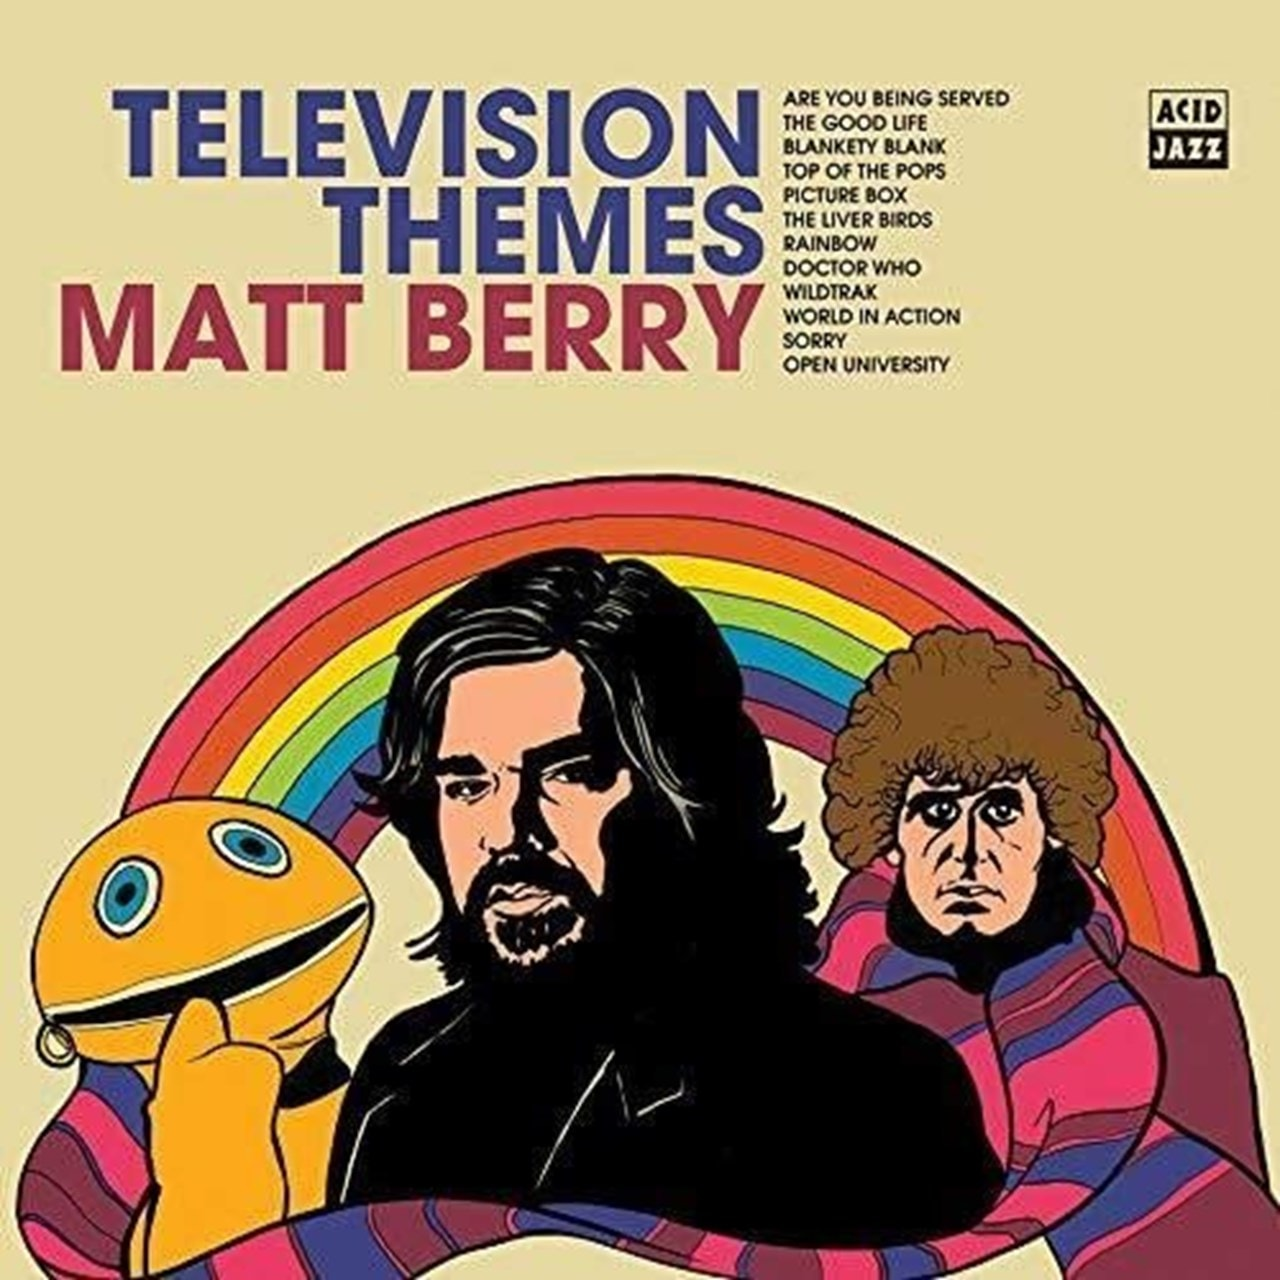 Television Themes - White Vinyl (LRS20) - 1